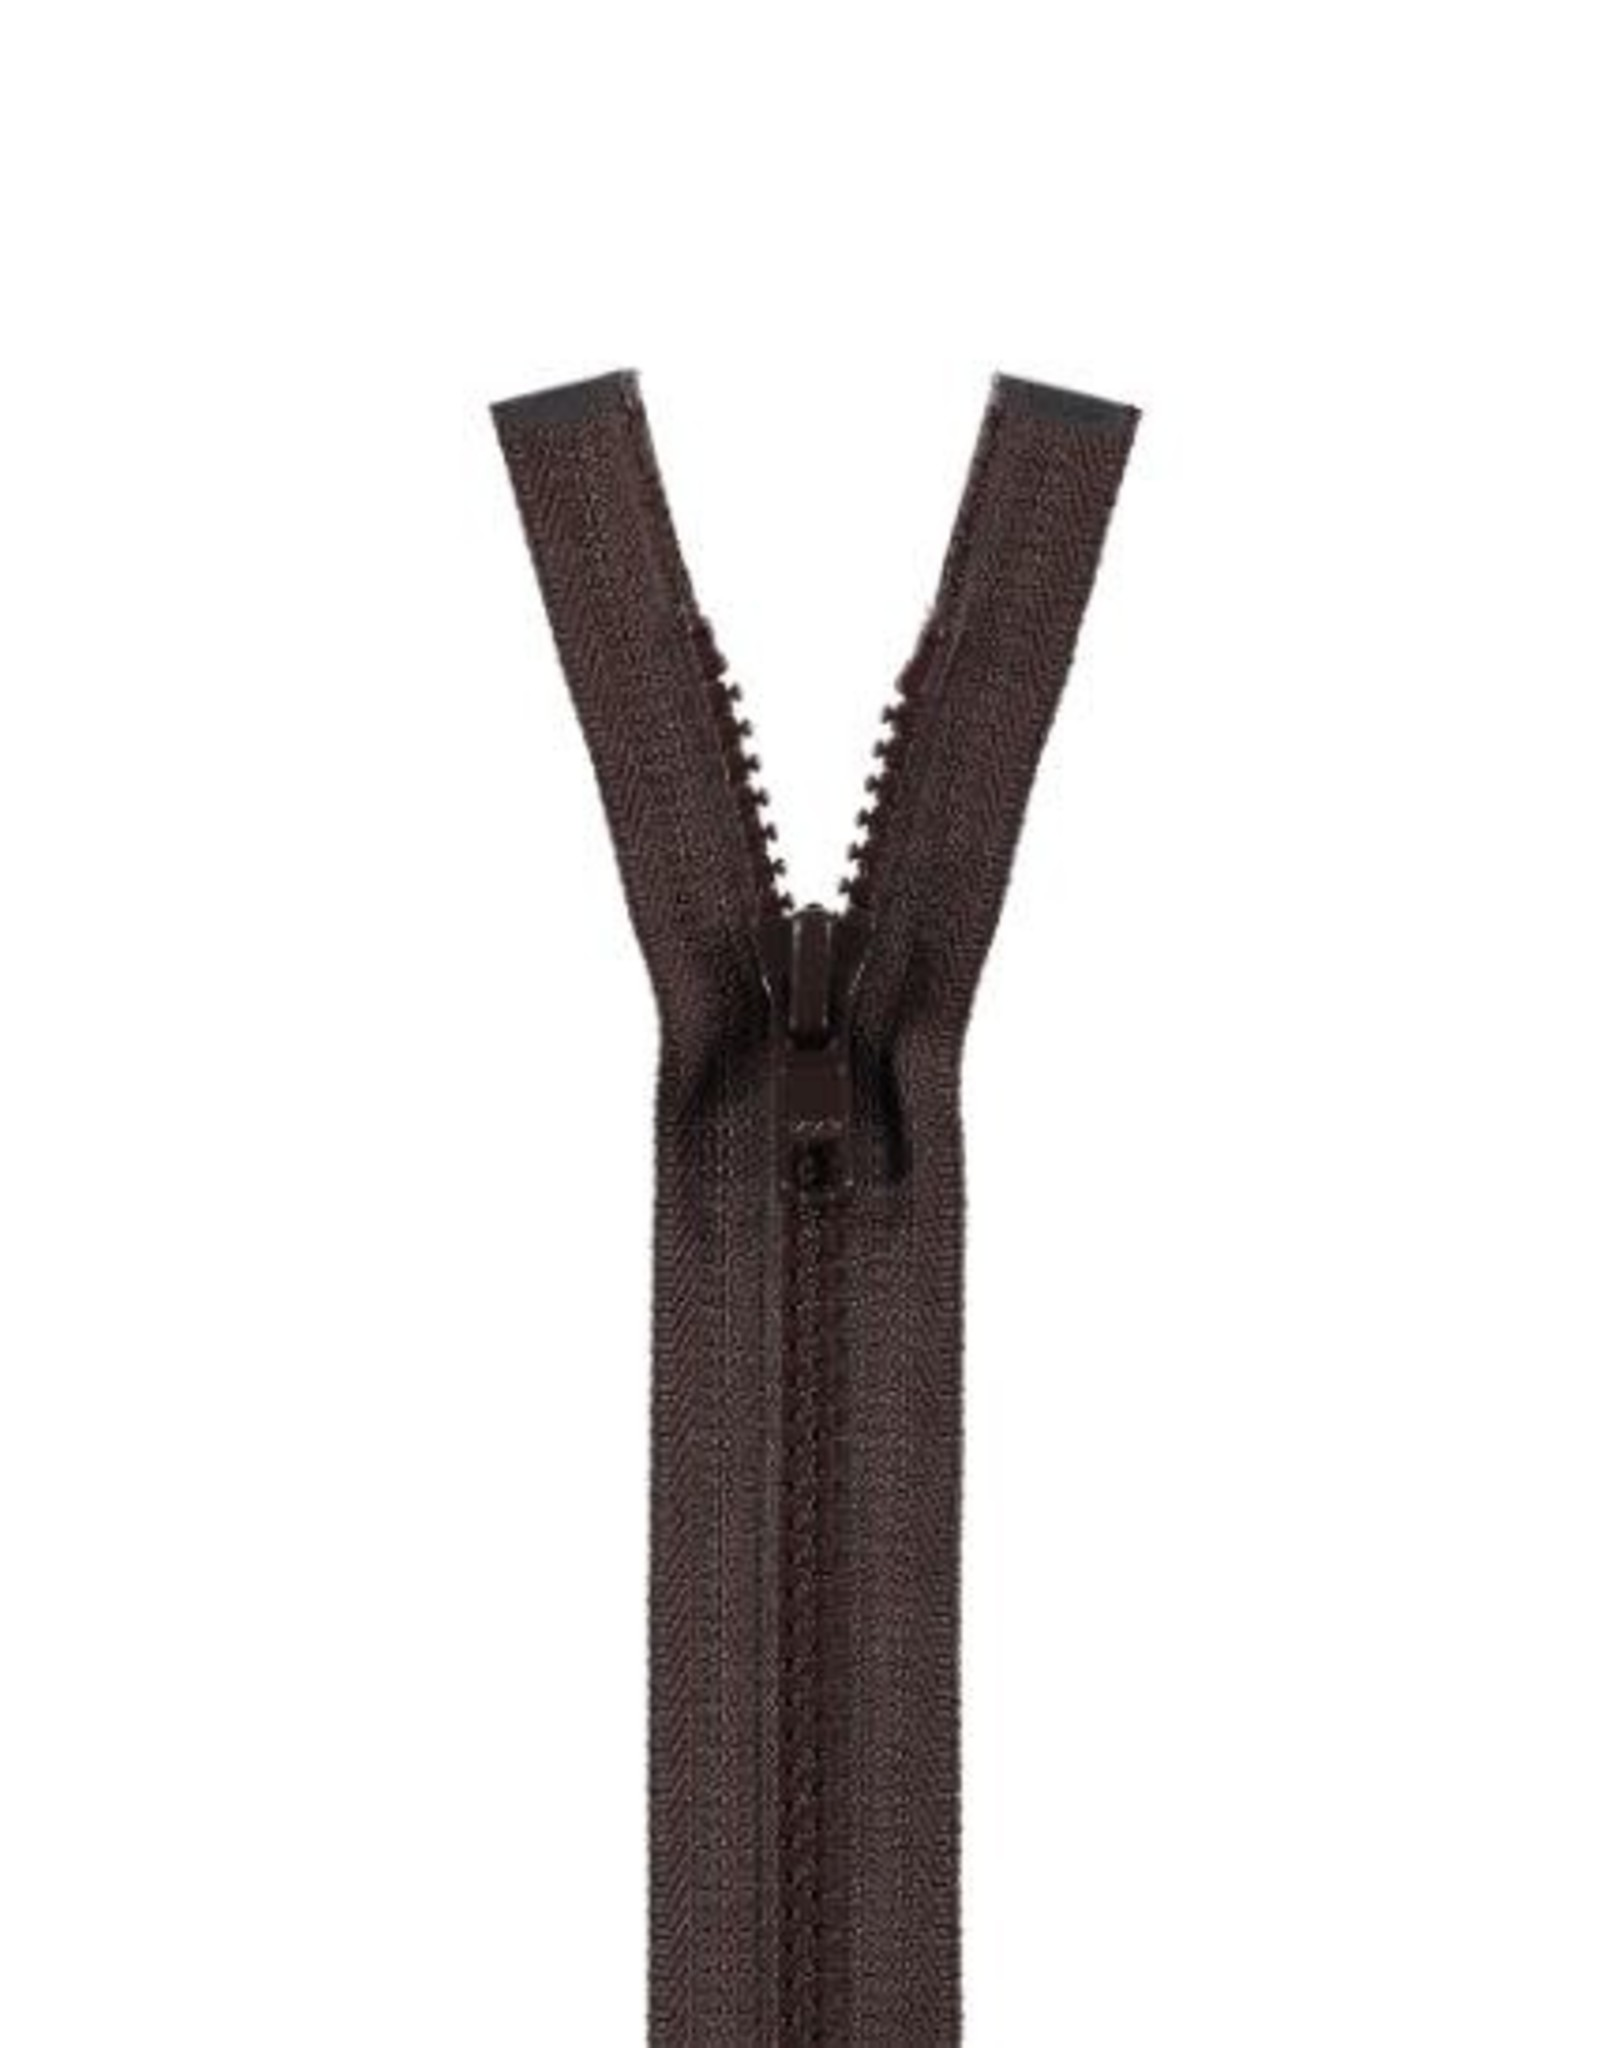 YKK BLOKRITS 5 DEELBAAR bruin 570-45cm